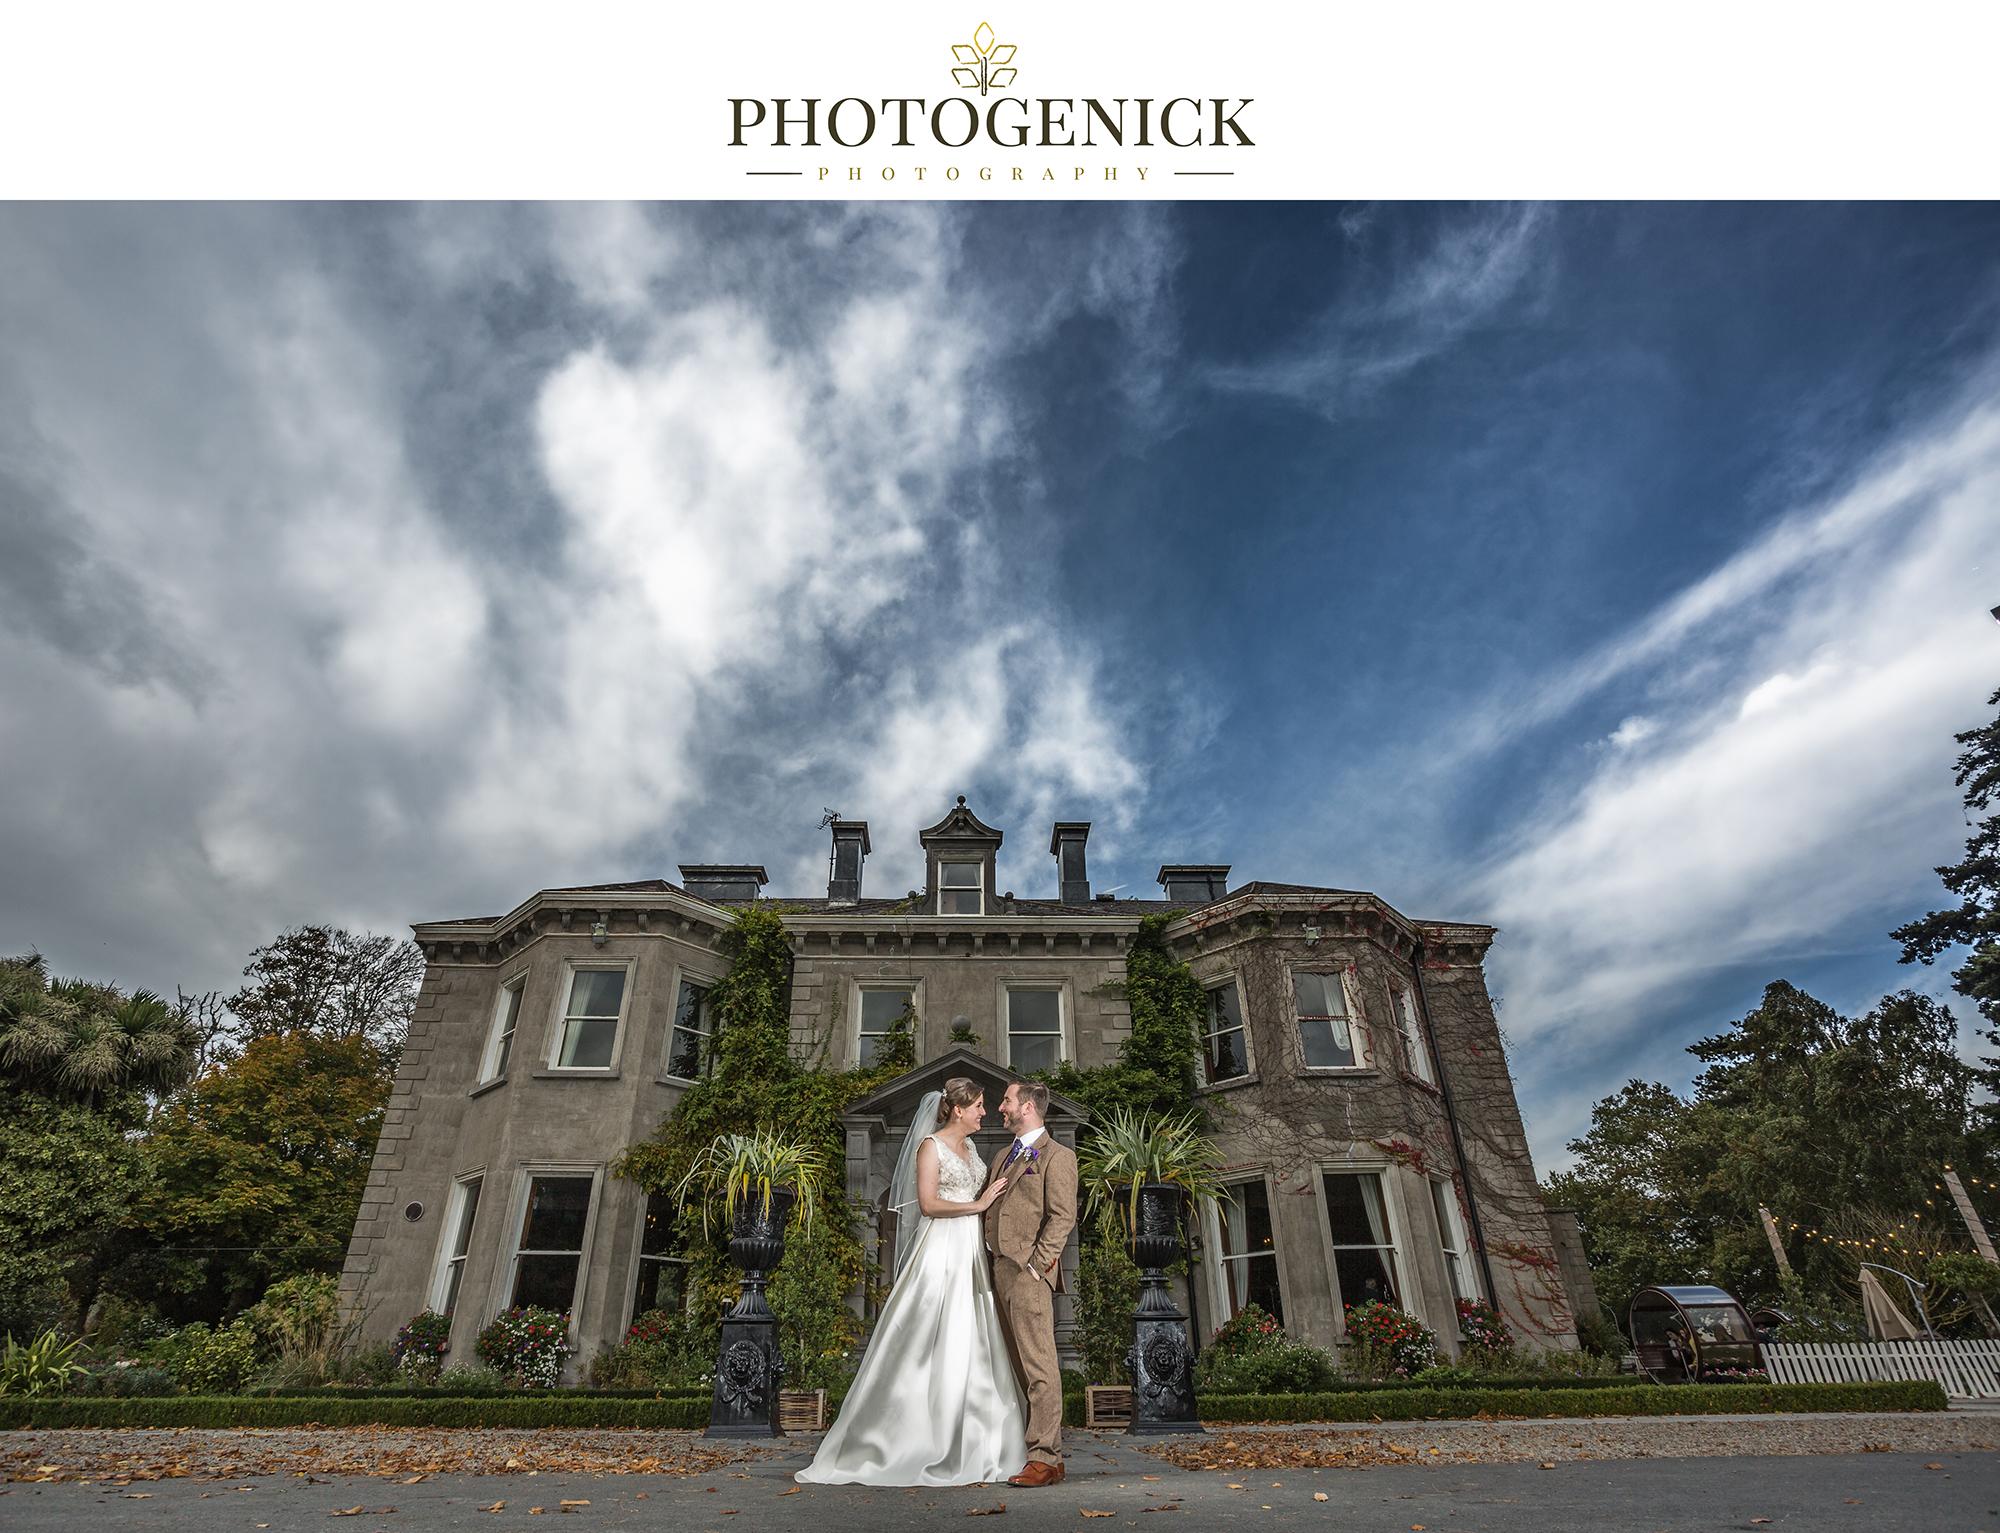 destination wedding photographers in rotherham